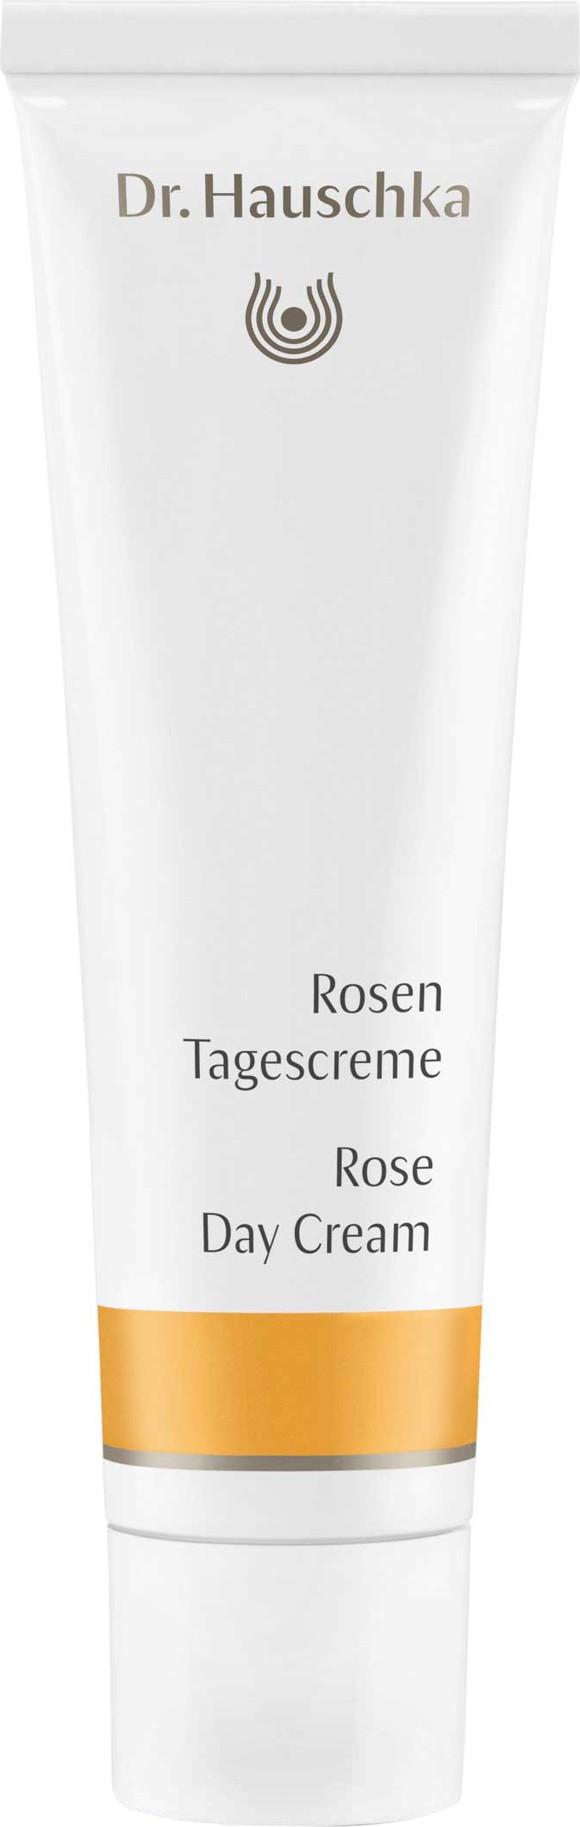 Dr. Hauschka - Rose Tagescreme 30 ml